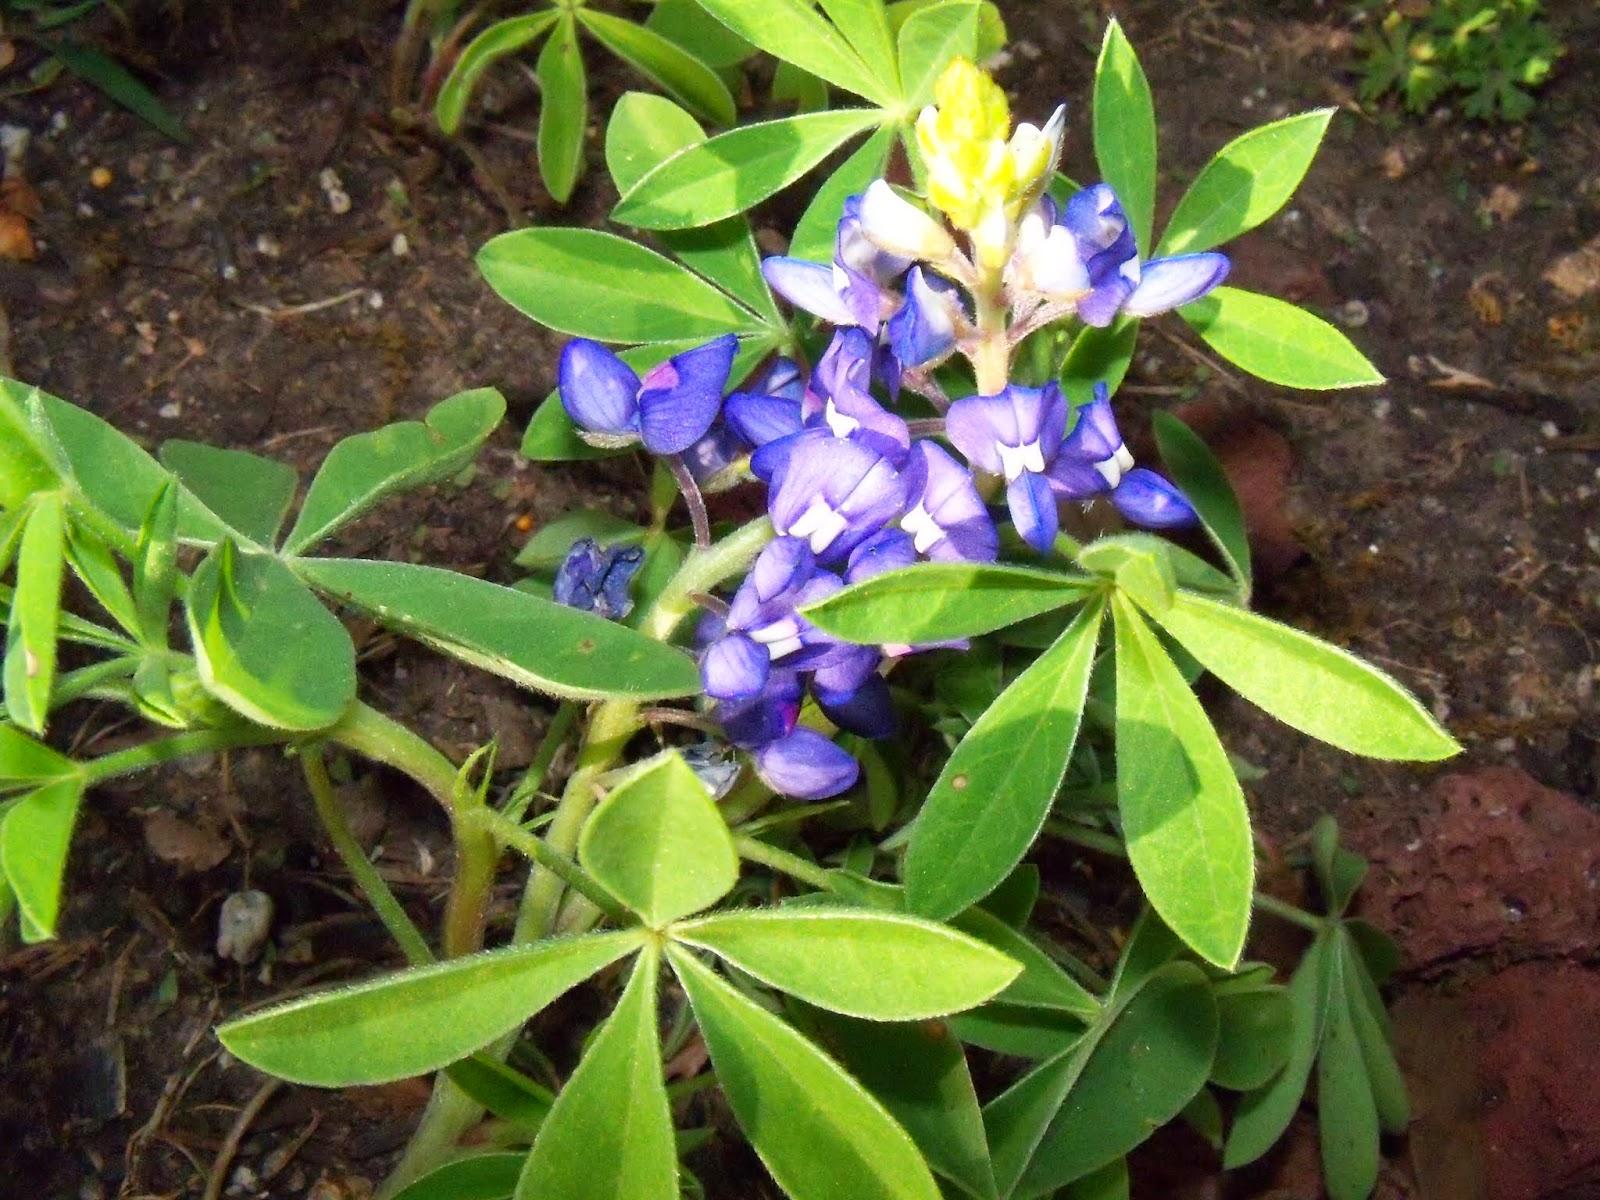 Gardening 2015 - 116_7678.JPG